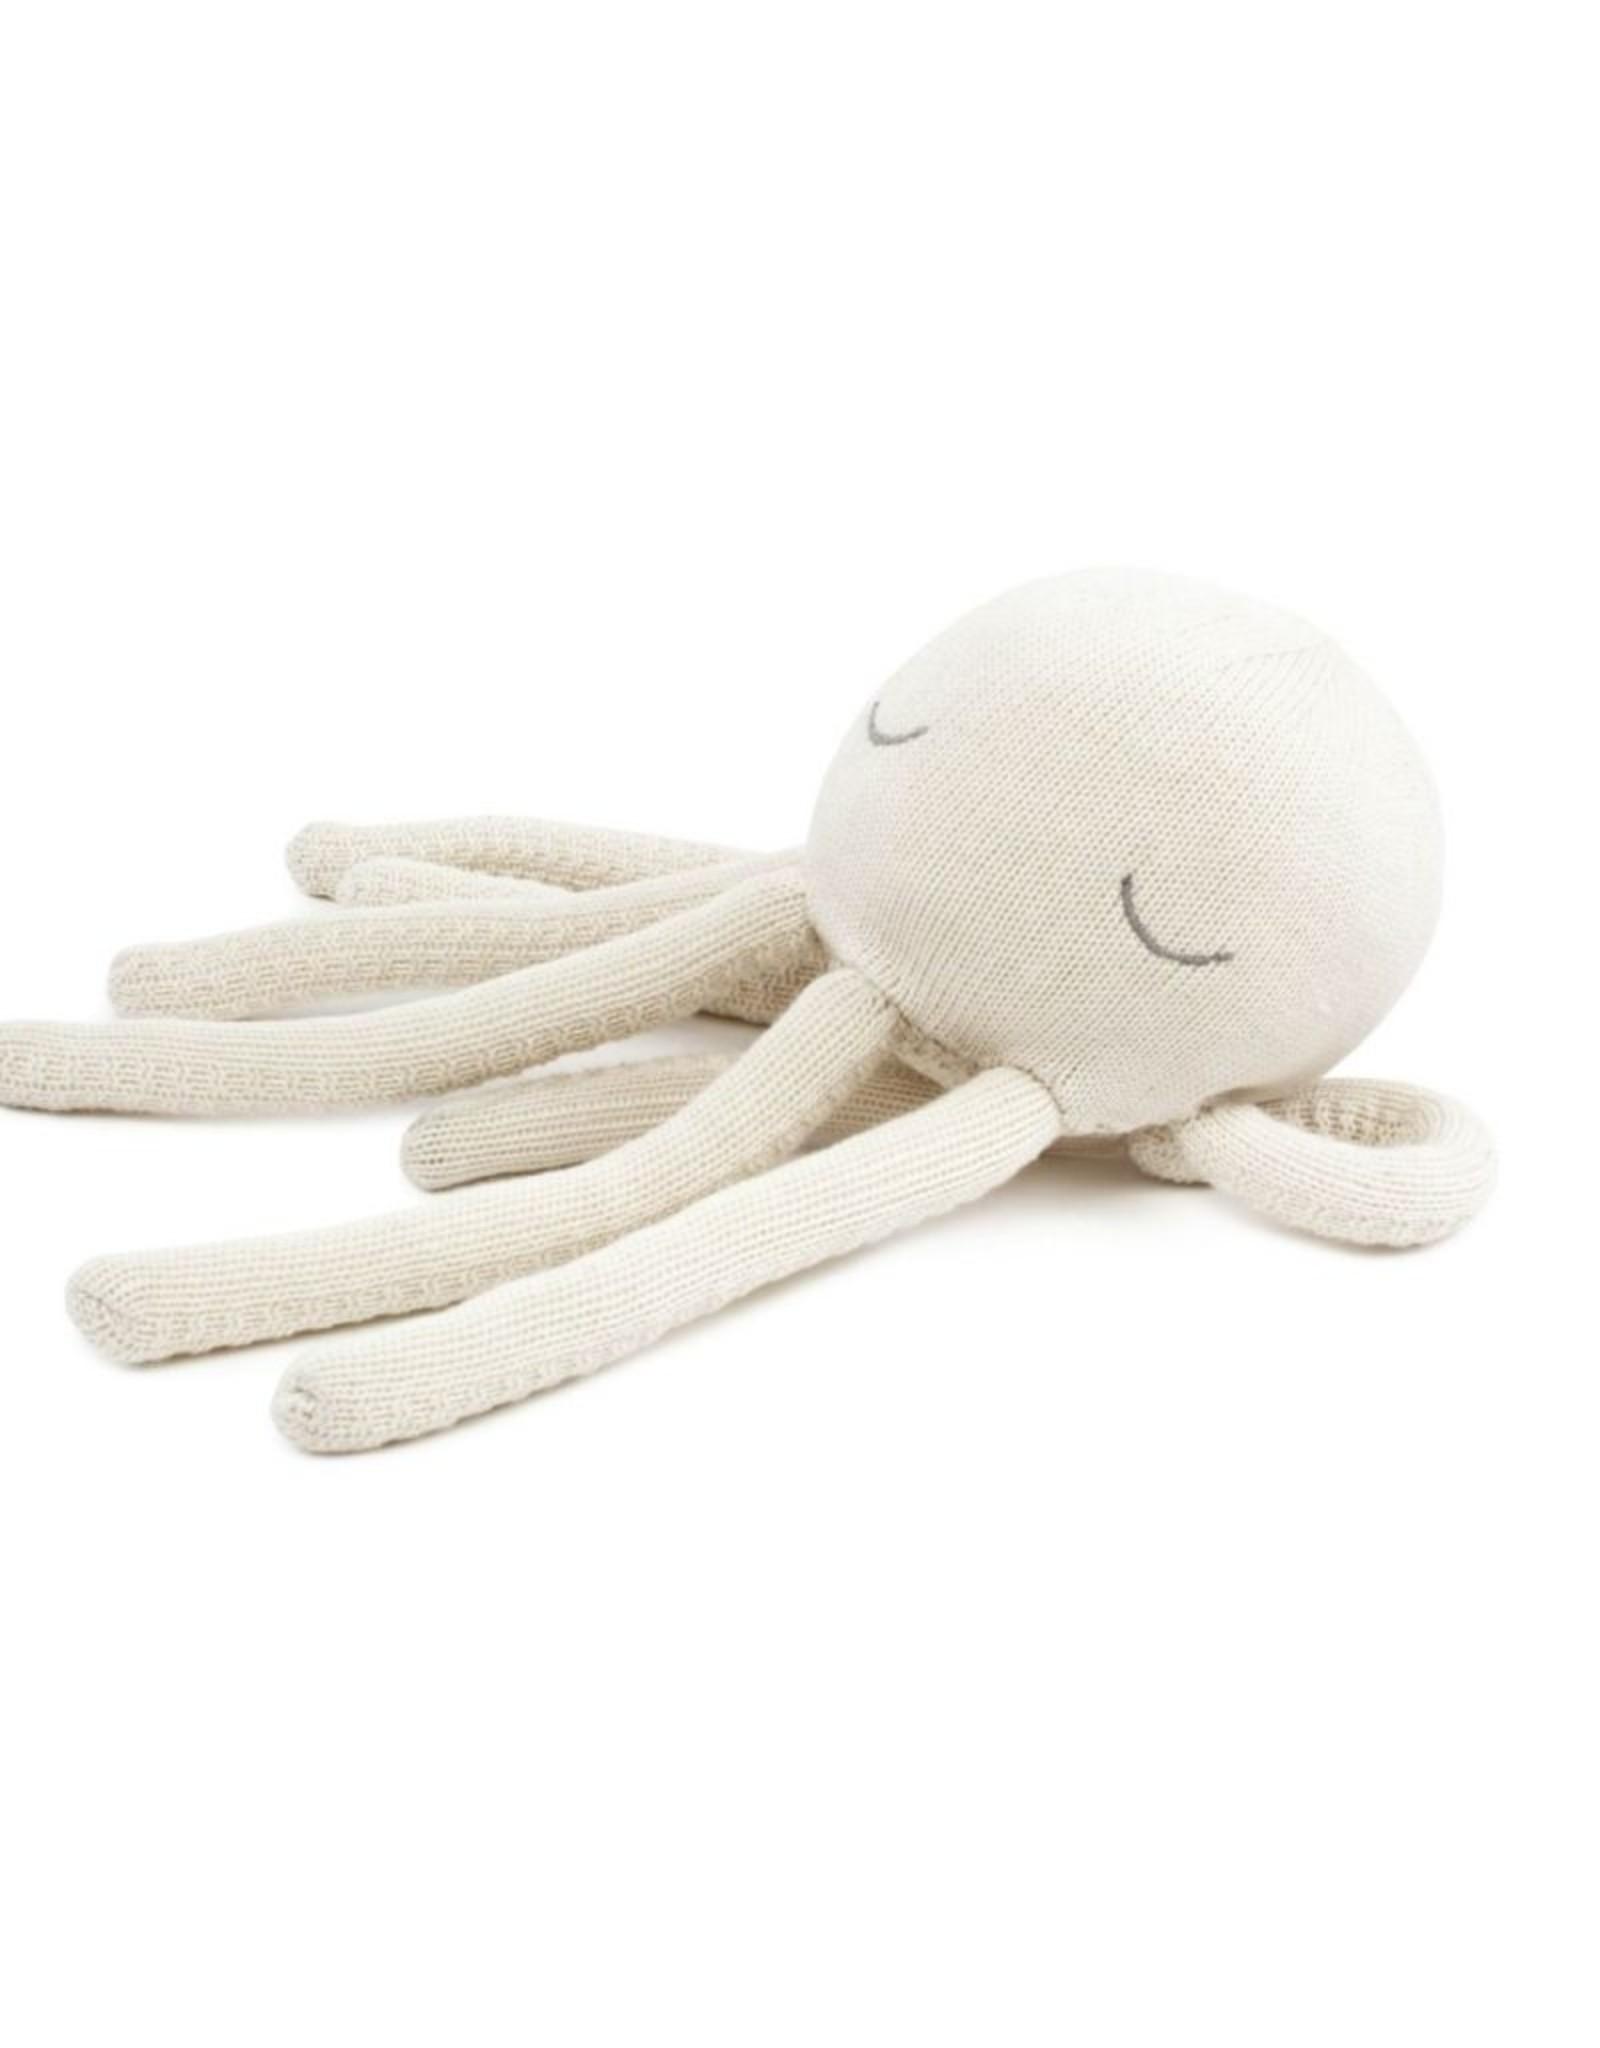 POOFI Poofi - Octopus cuddle toy - cream